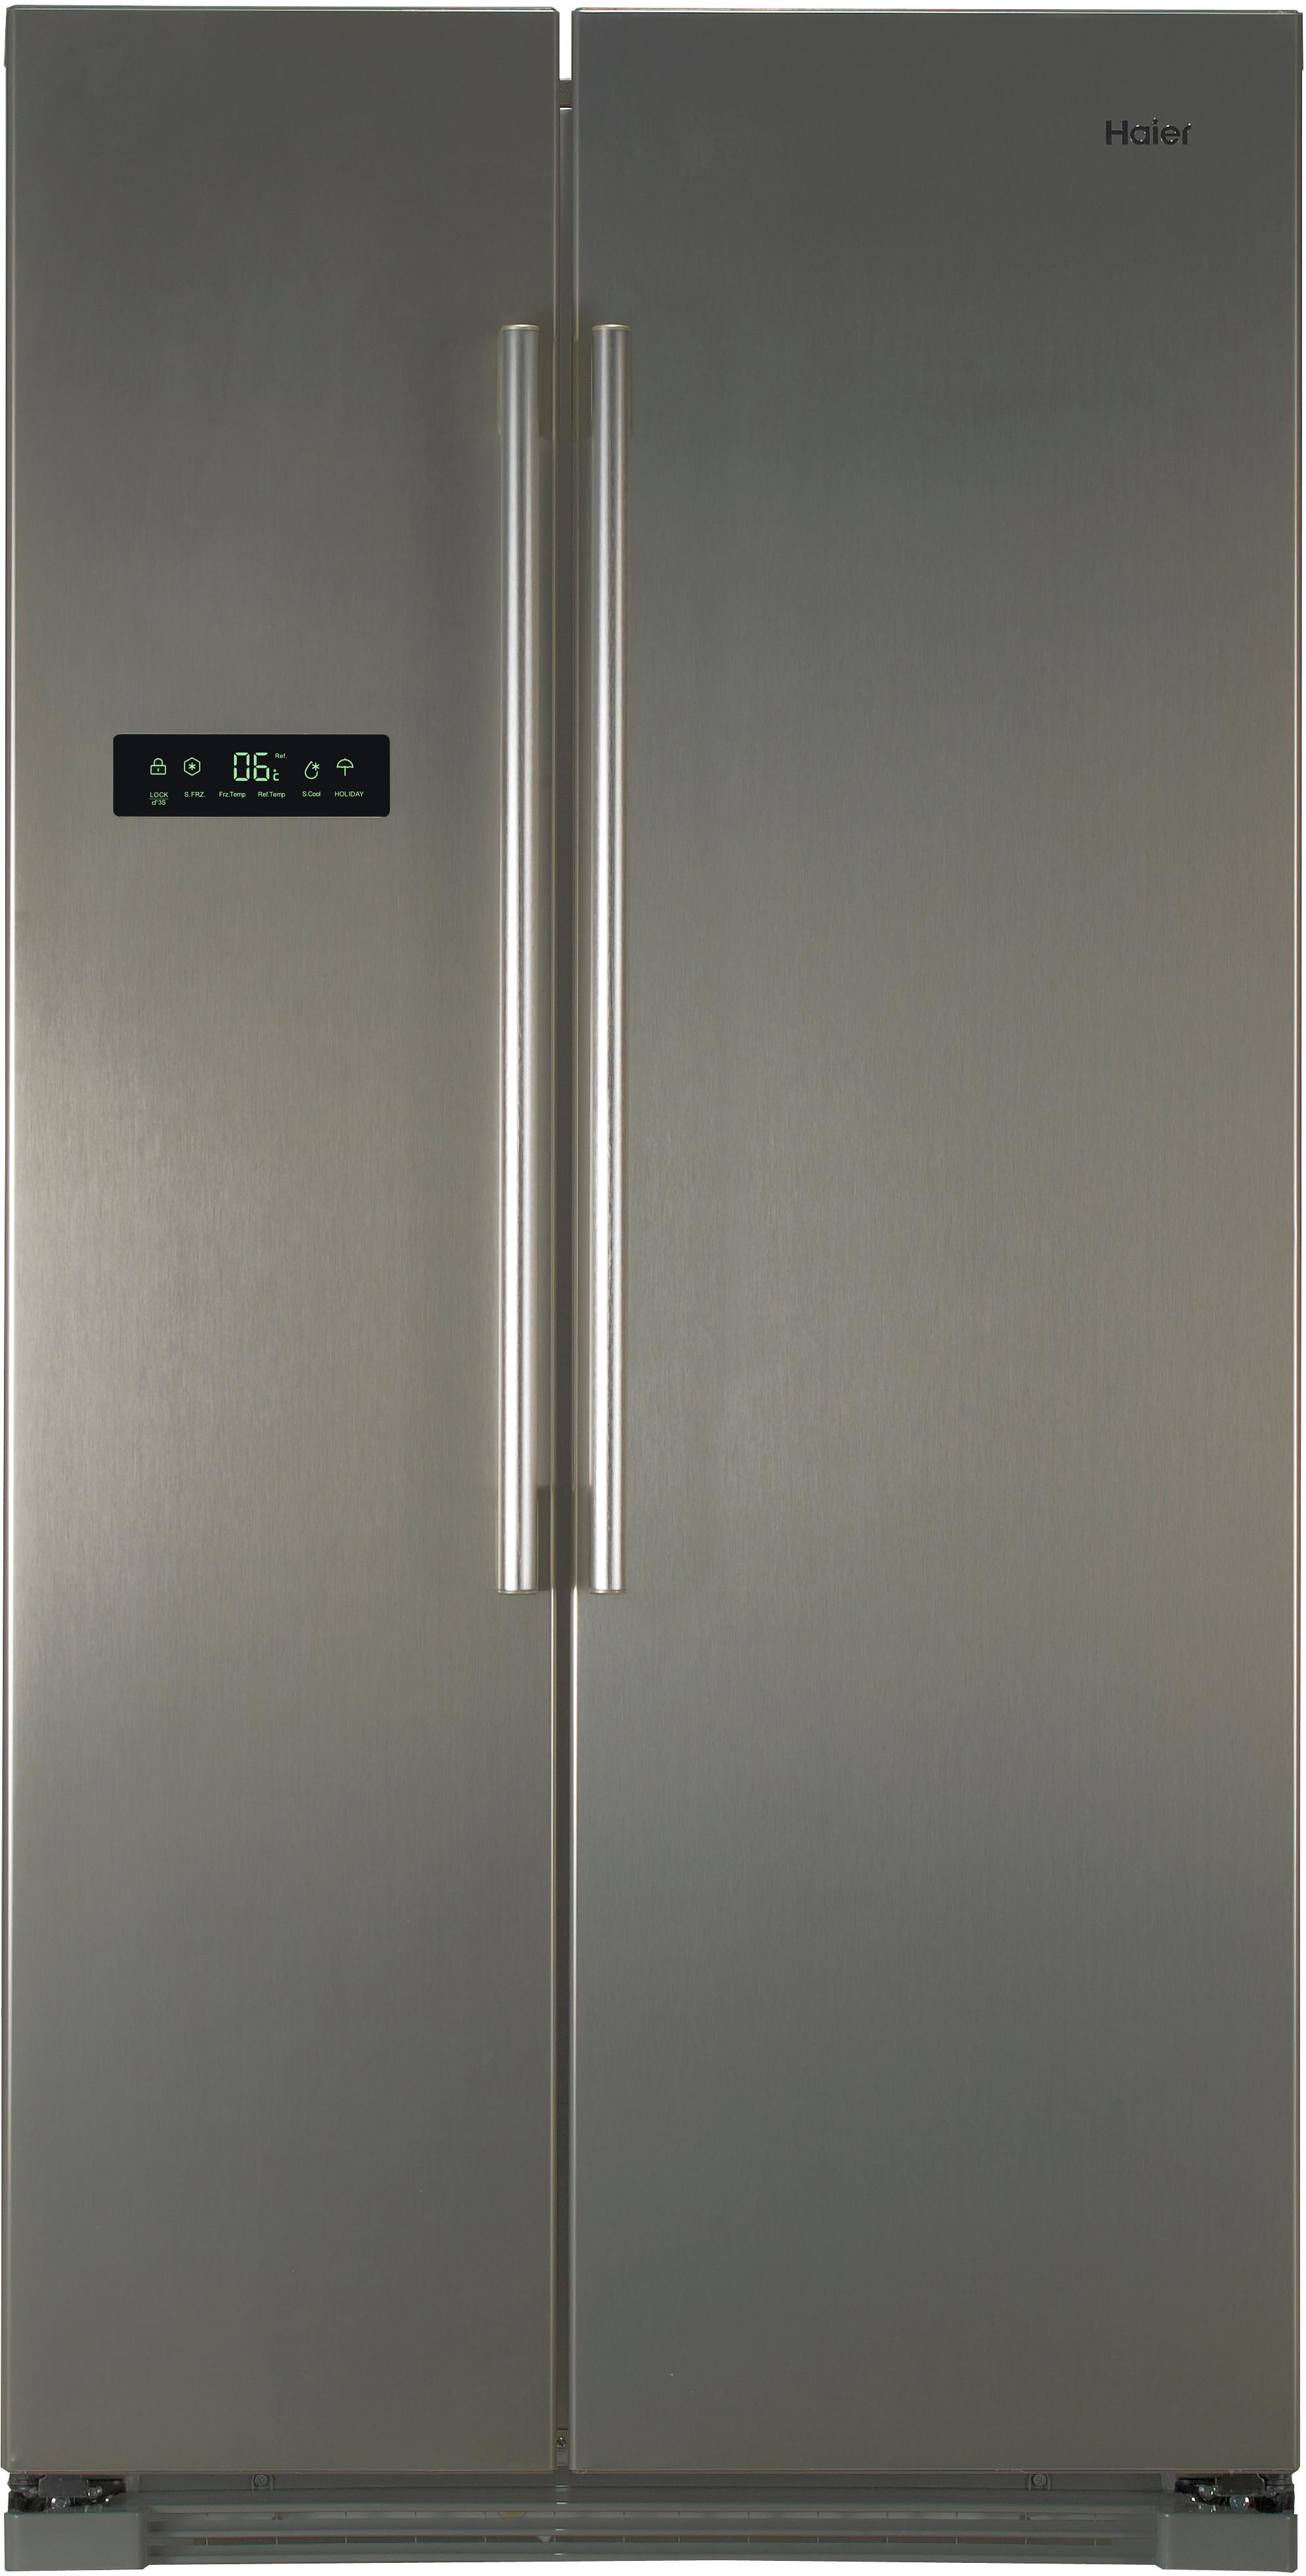 Siemens KI81RAD30 review